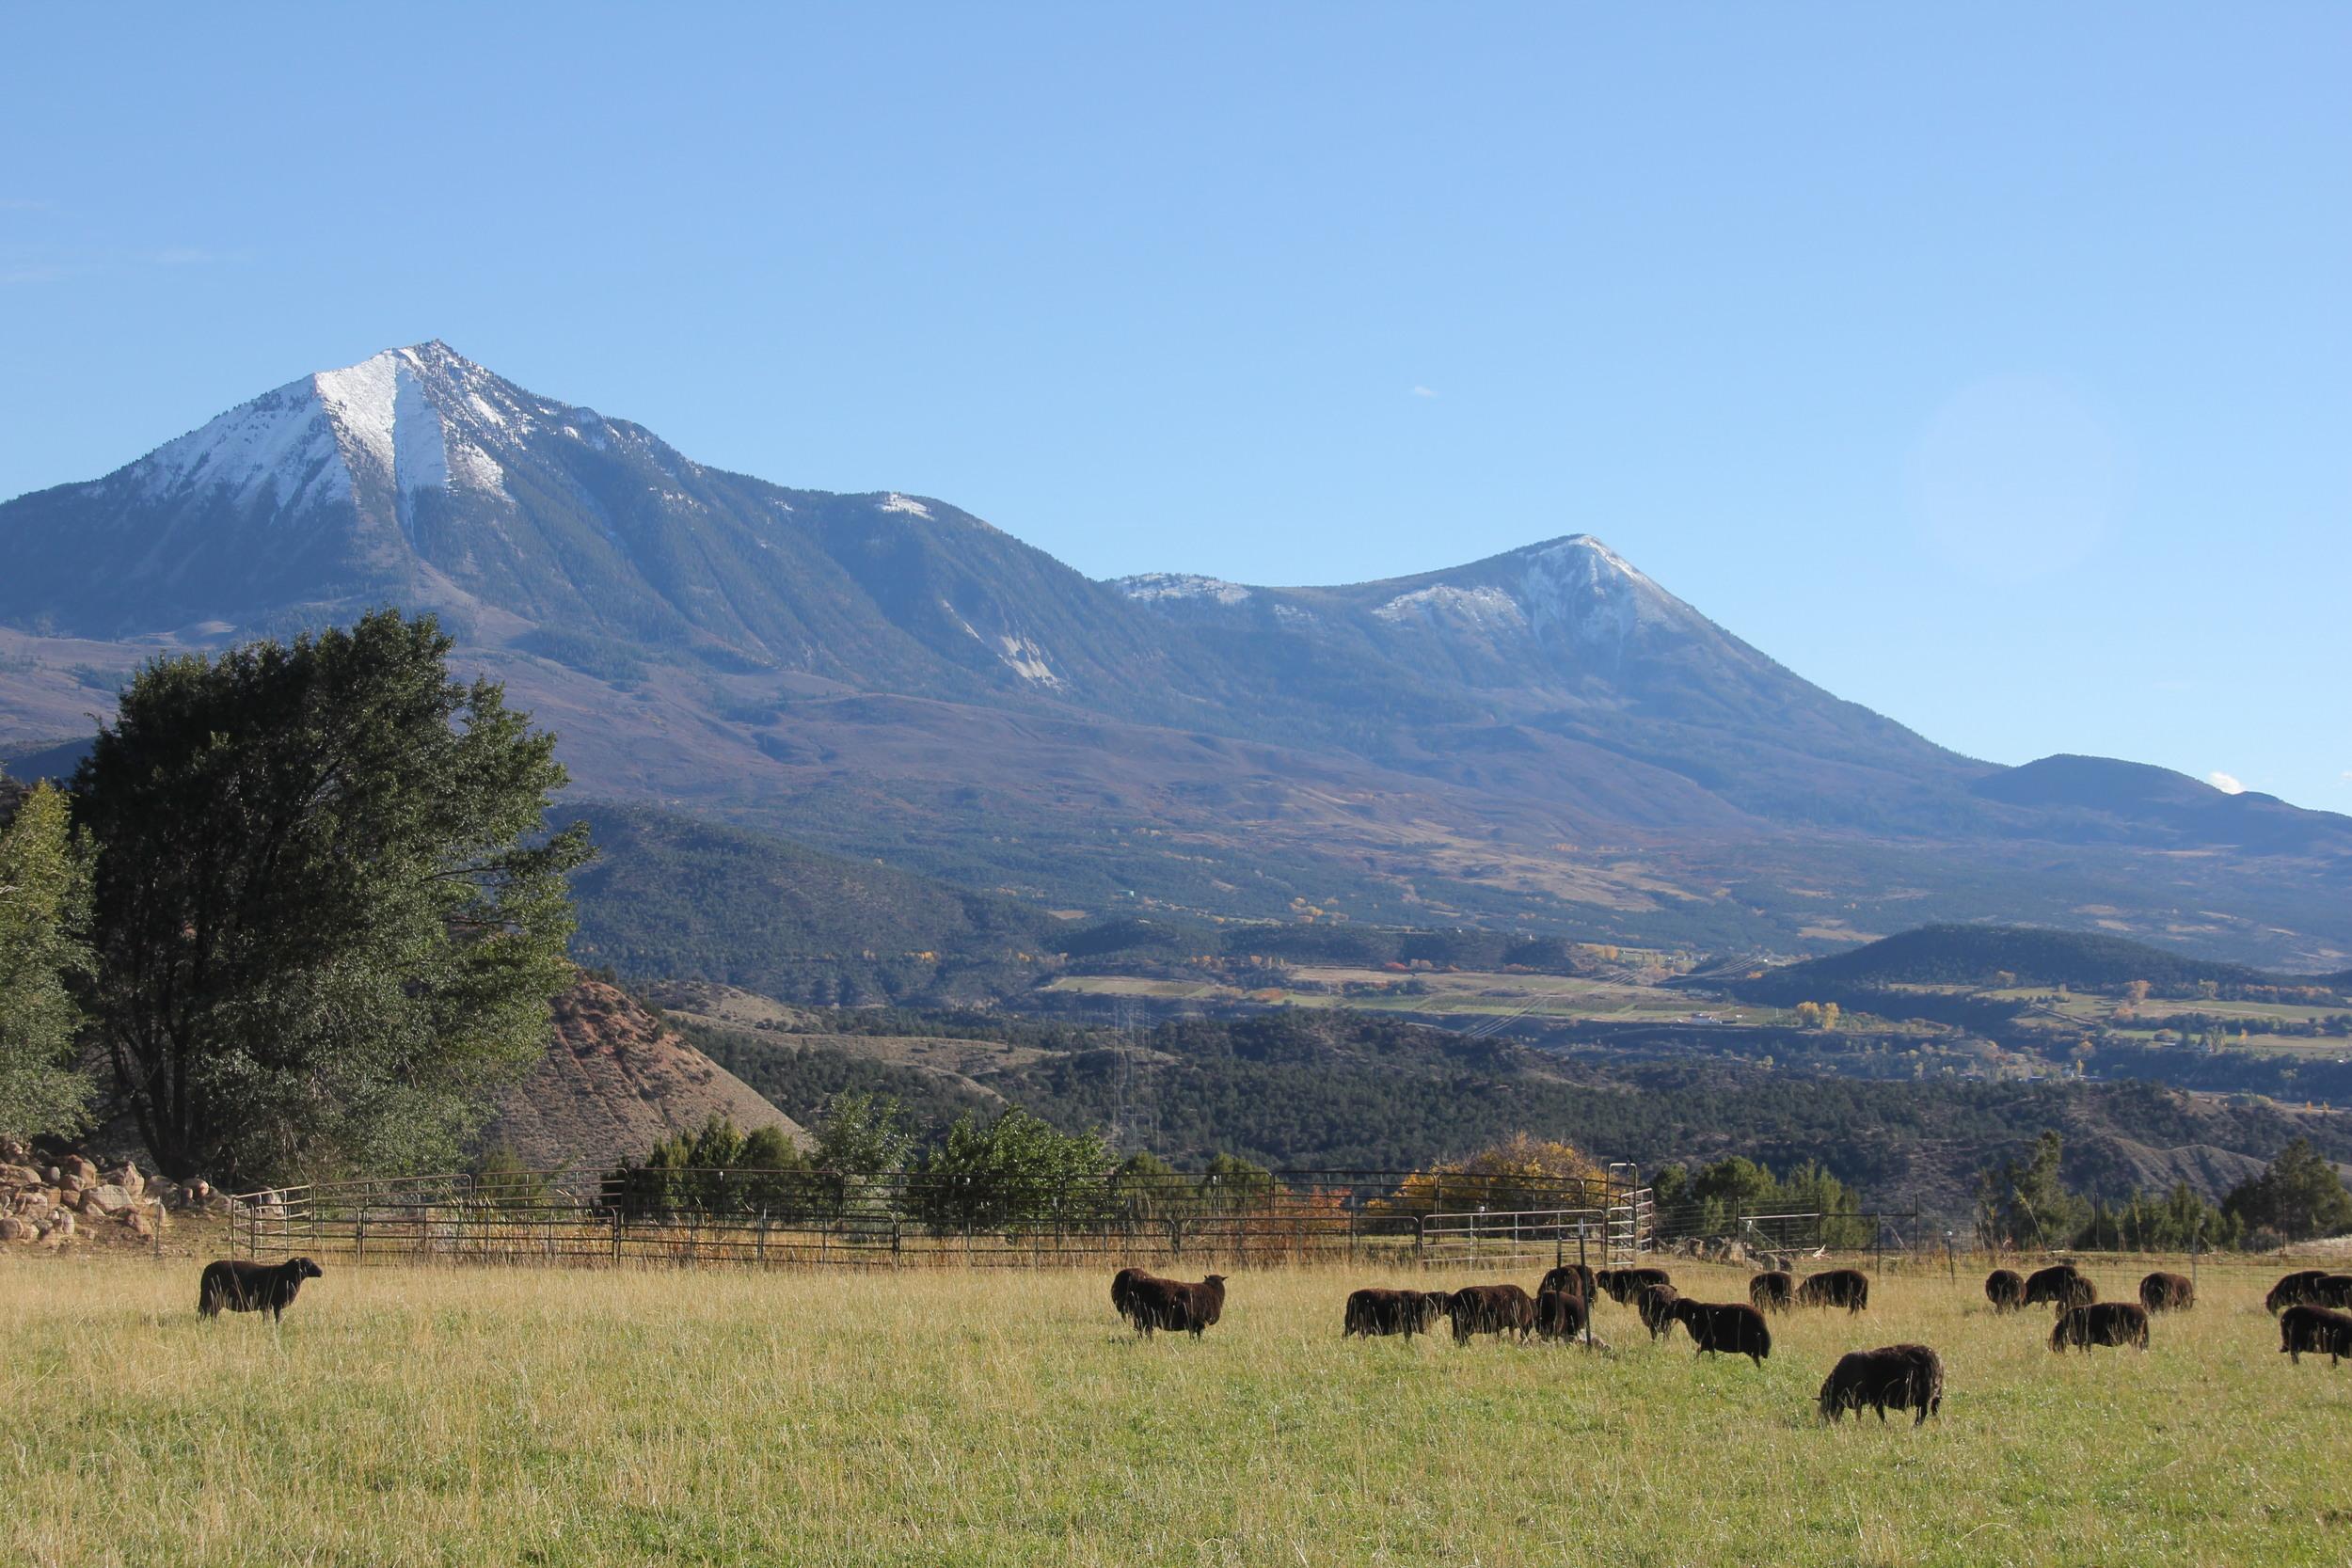 Black Welsh Mountain sheep at Desert Weyr farm, Colorado